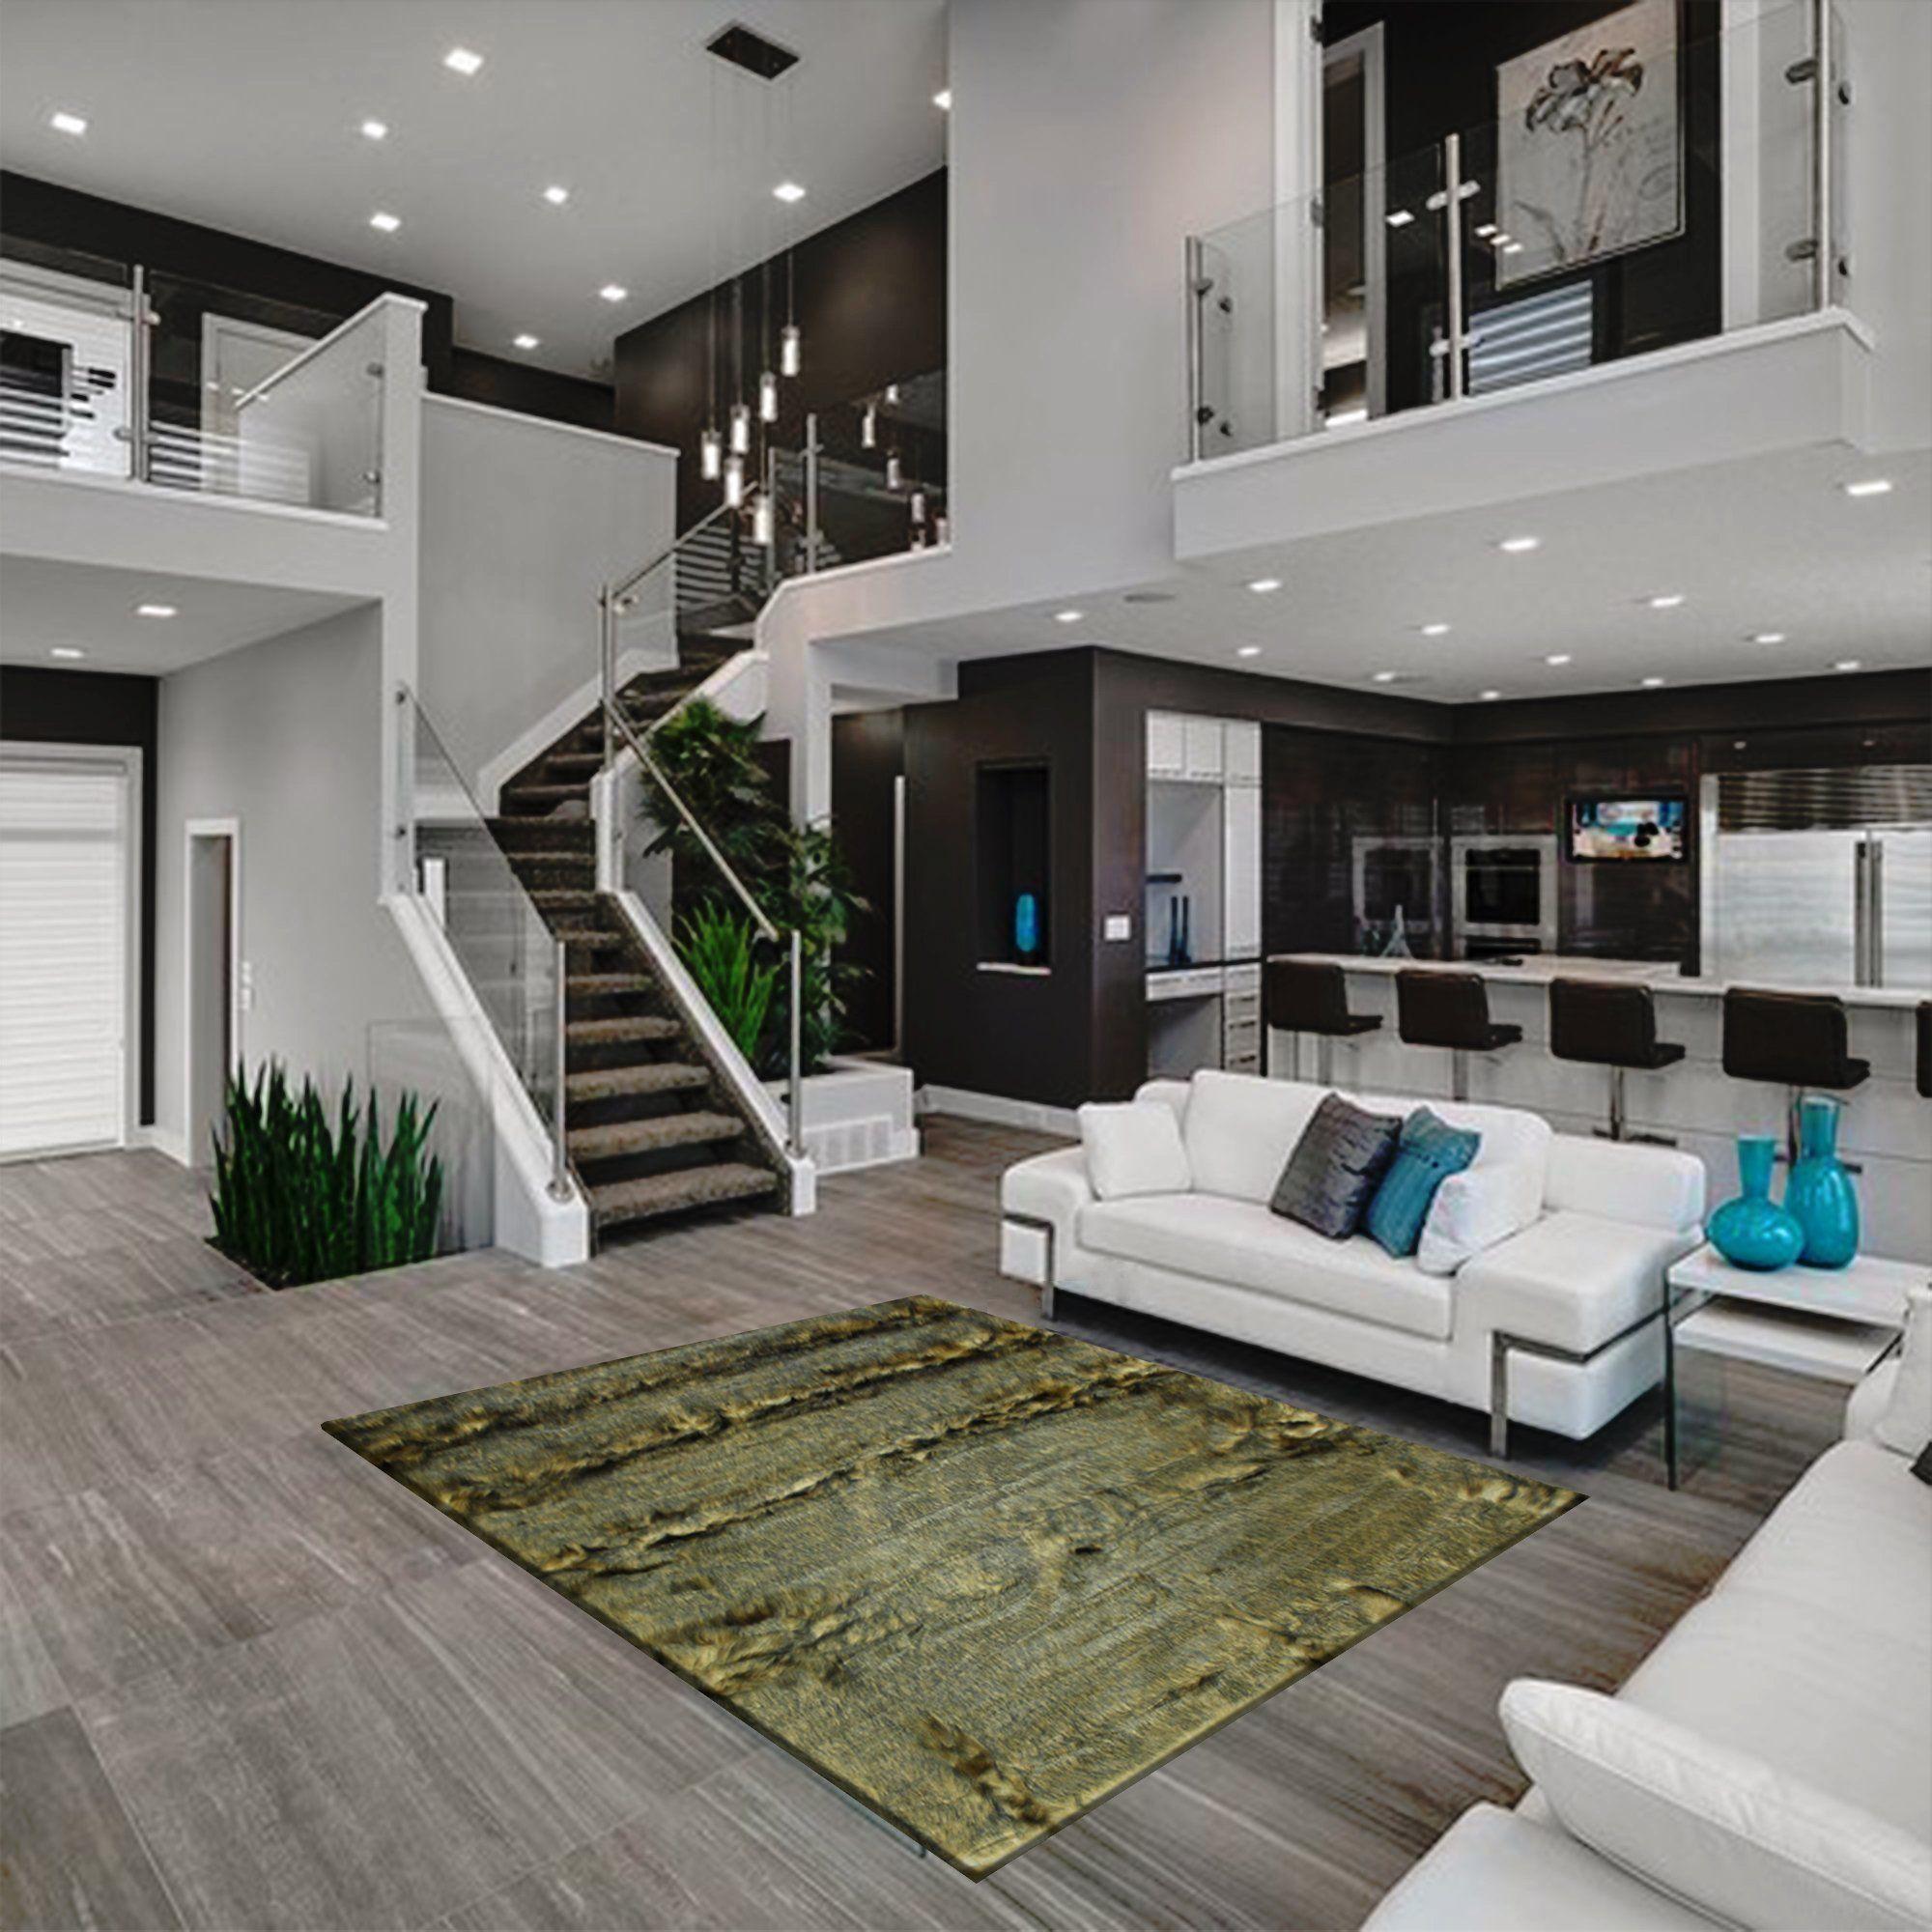 Interior House Construction Design